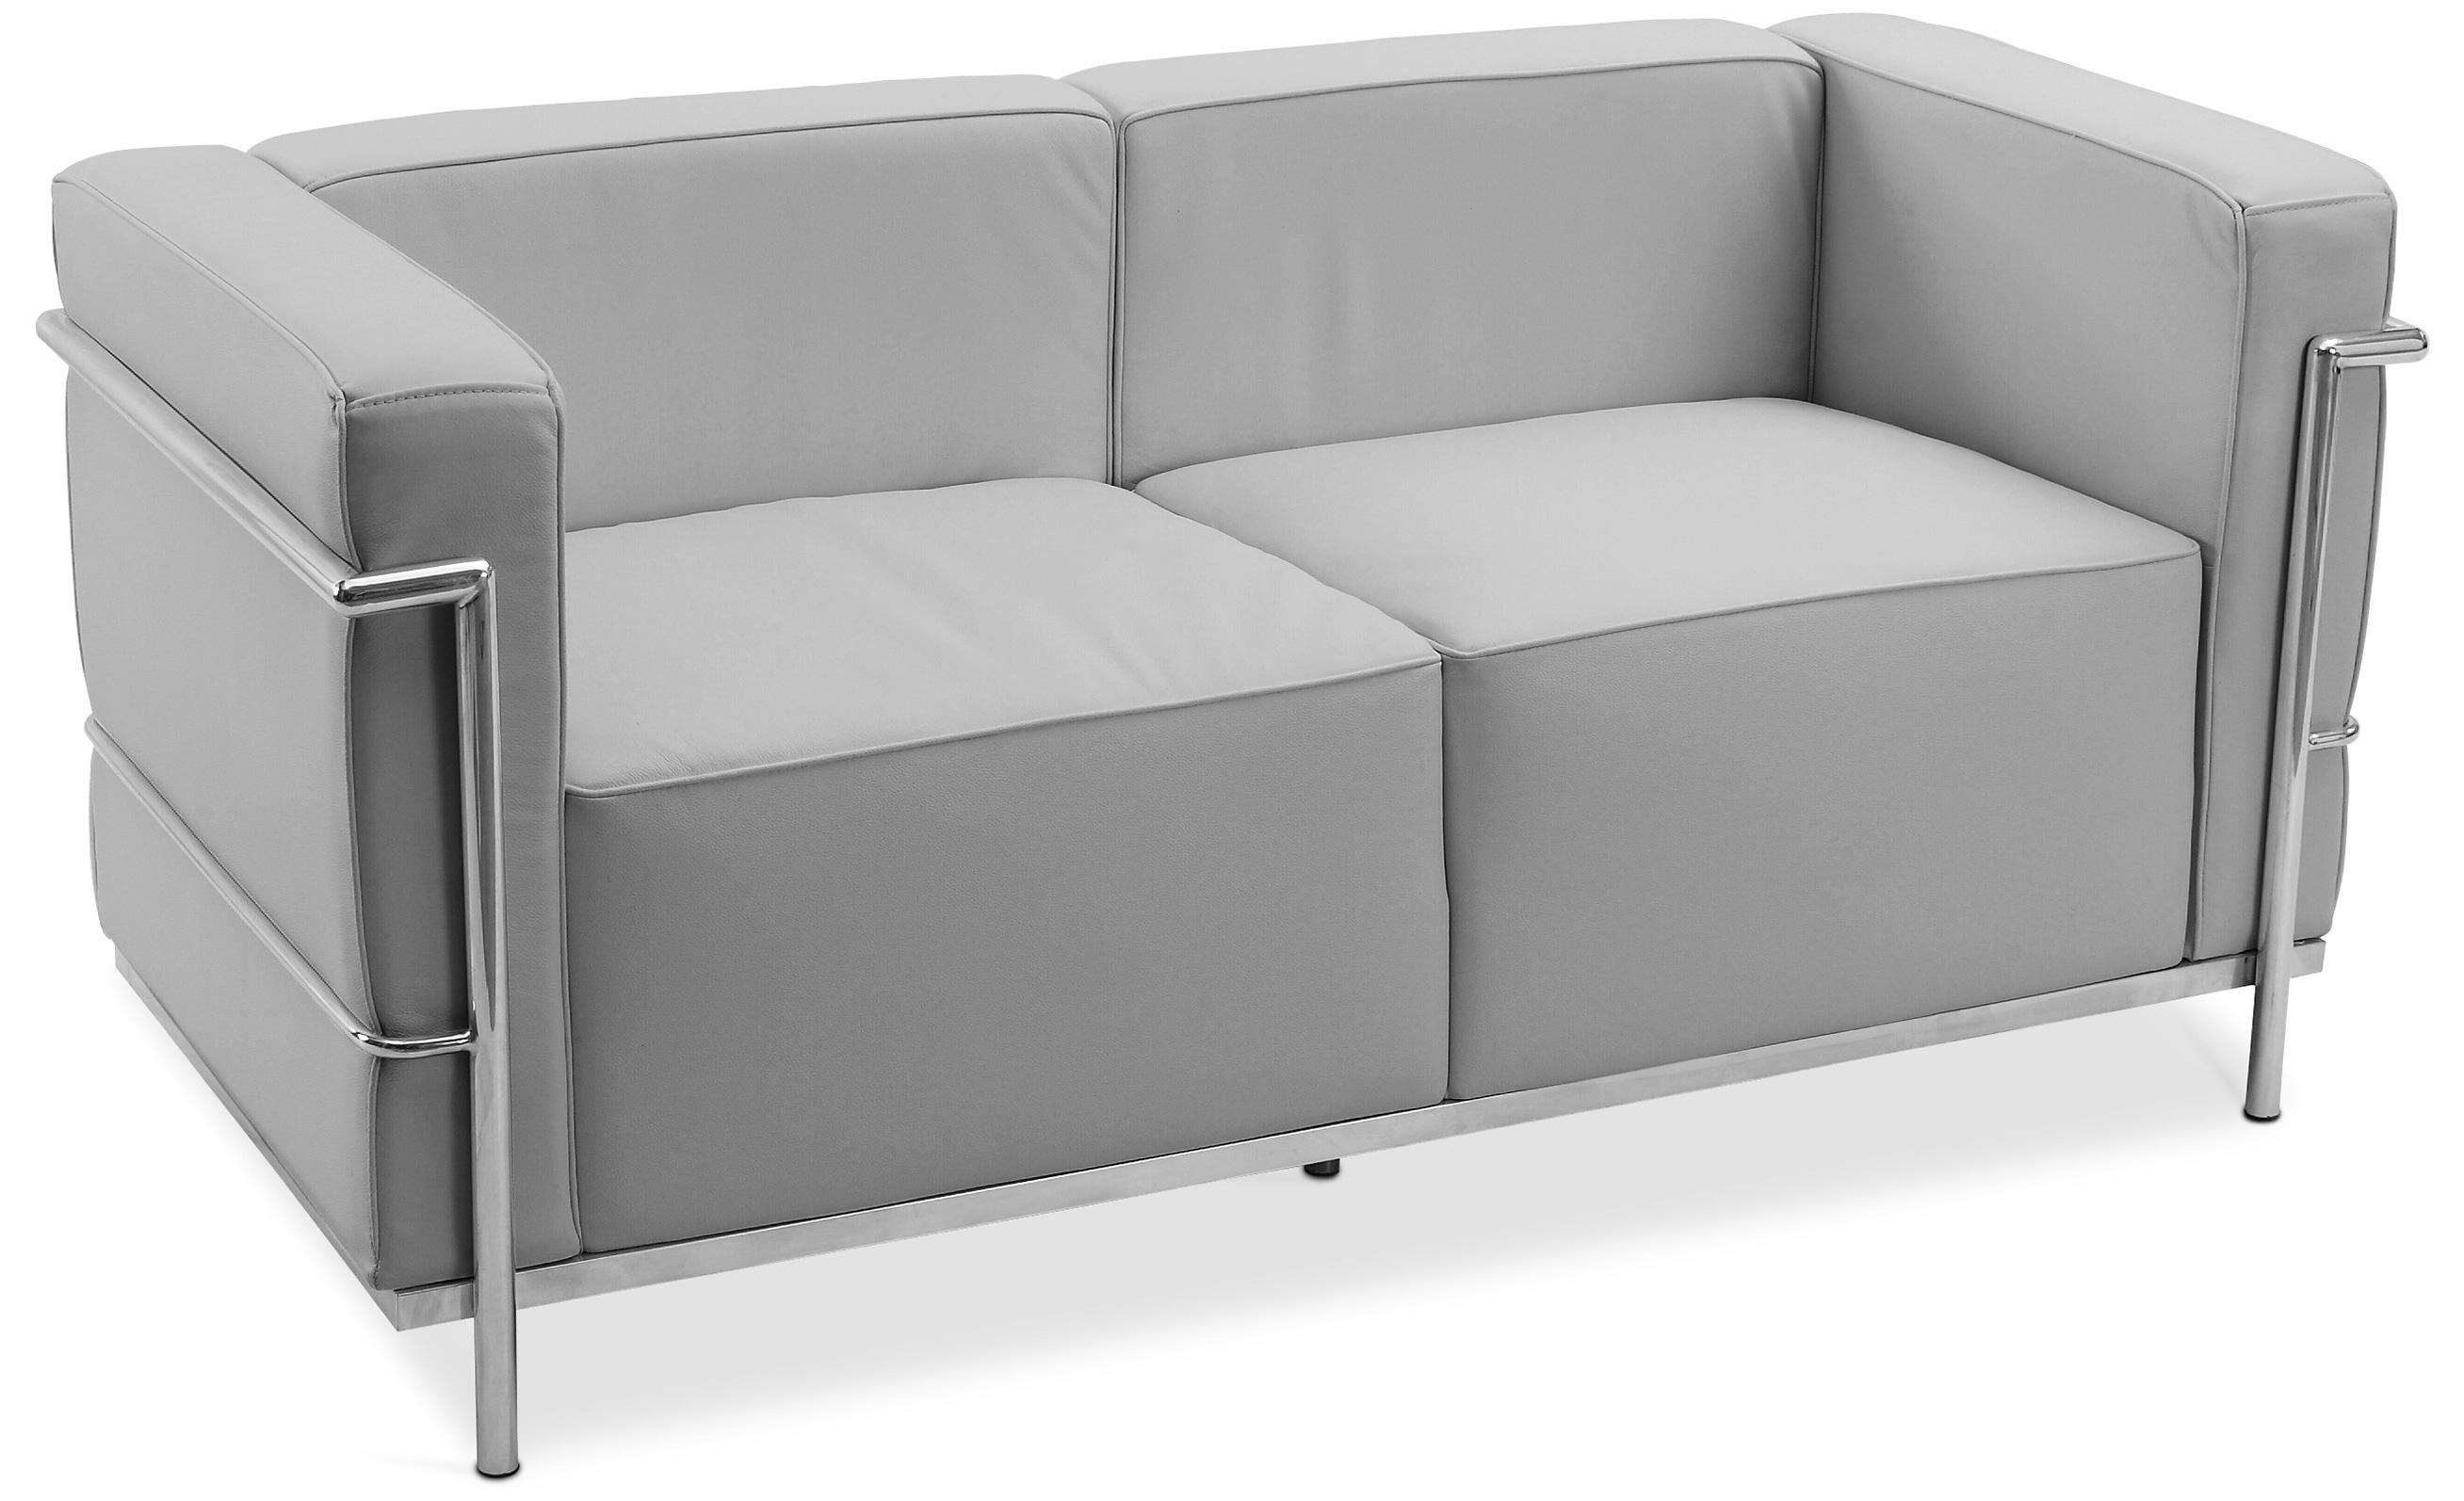 canap design 2 places cuir gris inspir lc3 le corbustier. Black Bedroom Furniture Sets. Home Design Ideas